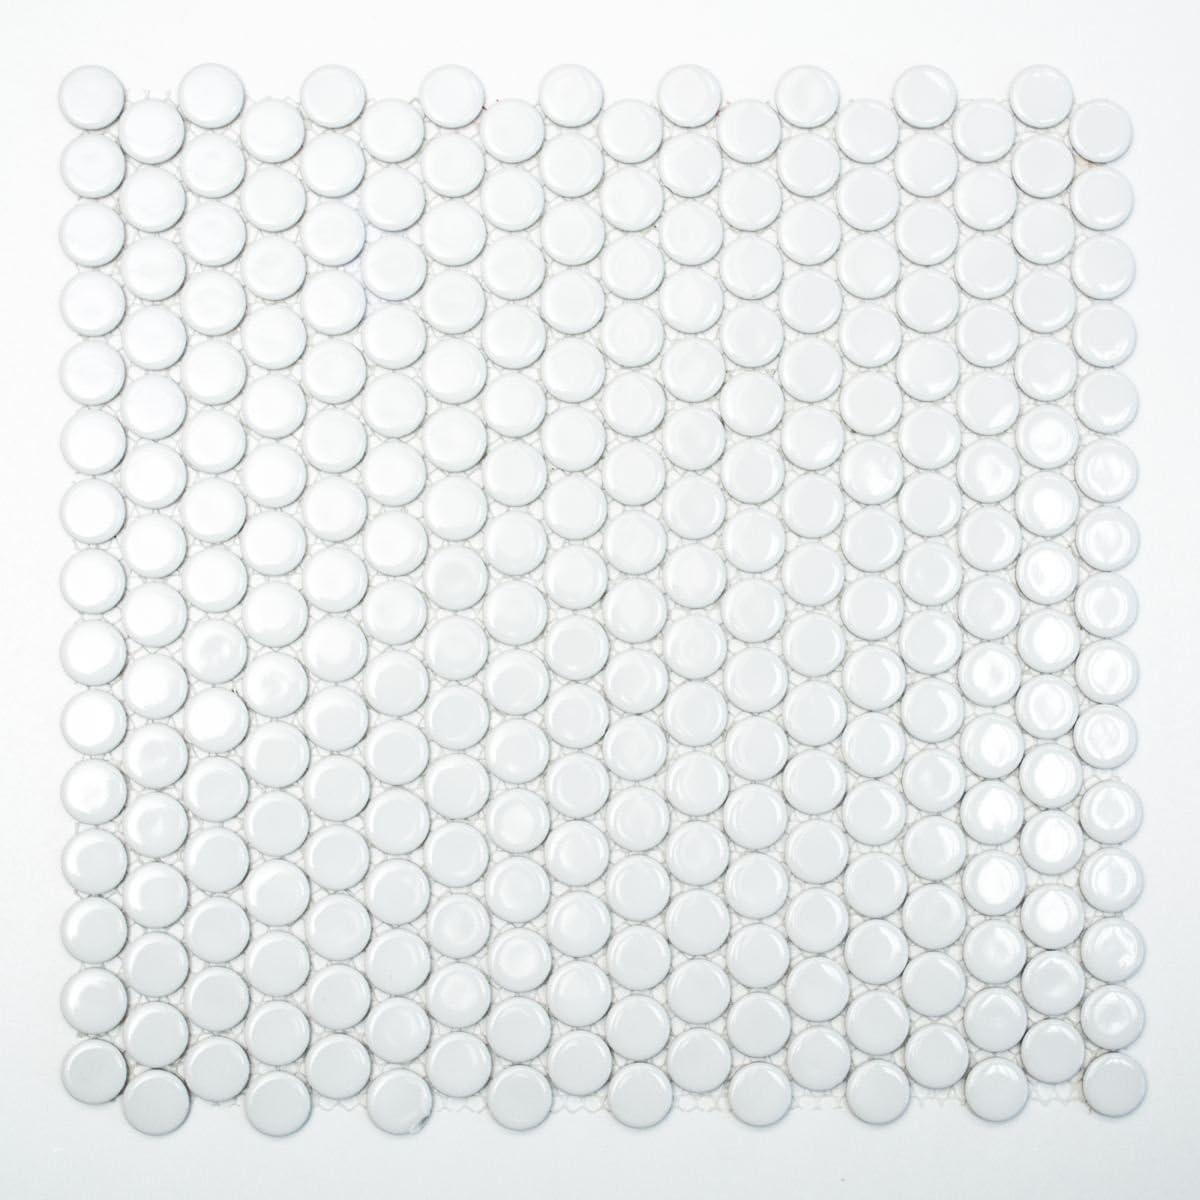 Mosaik Fliese Keramik Knopf wei/ß gl/änzend f/ür BODEN WAND BAD WC DUSCHE K/ÜCHE FLIESENSPIEGEL THEKENVERKLEIDUNG BADEWANNENVERKLEIDUNG Mosaikmatte Mosaikplatte